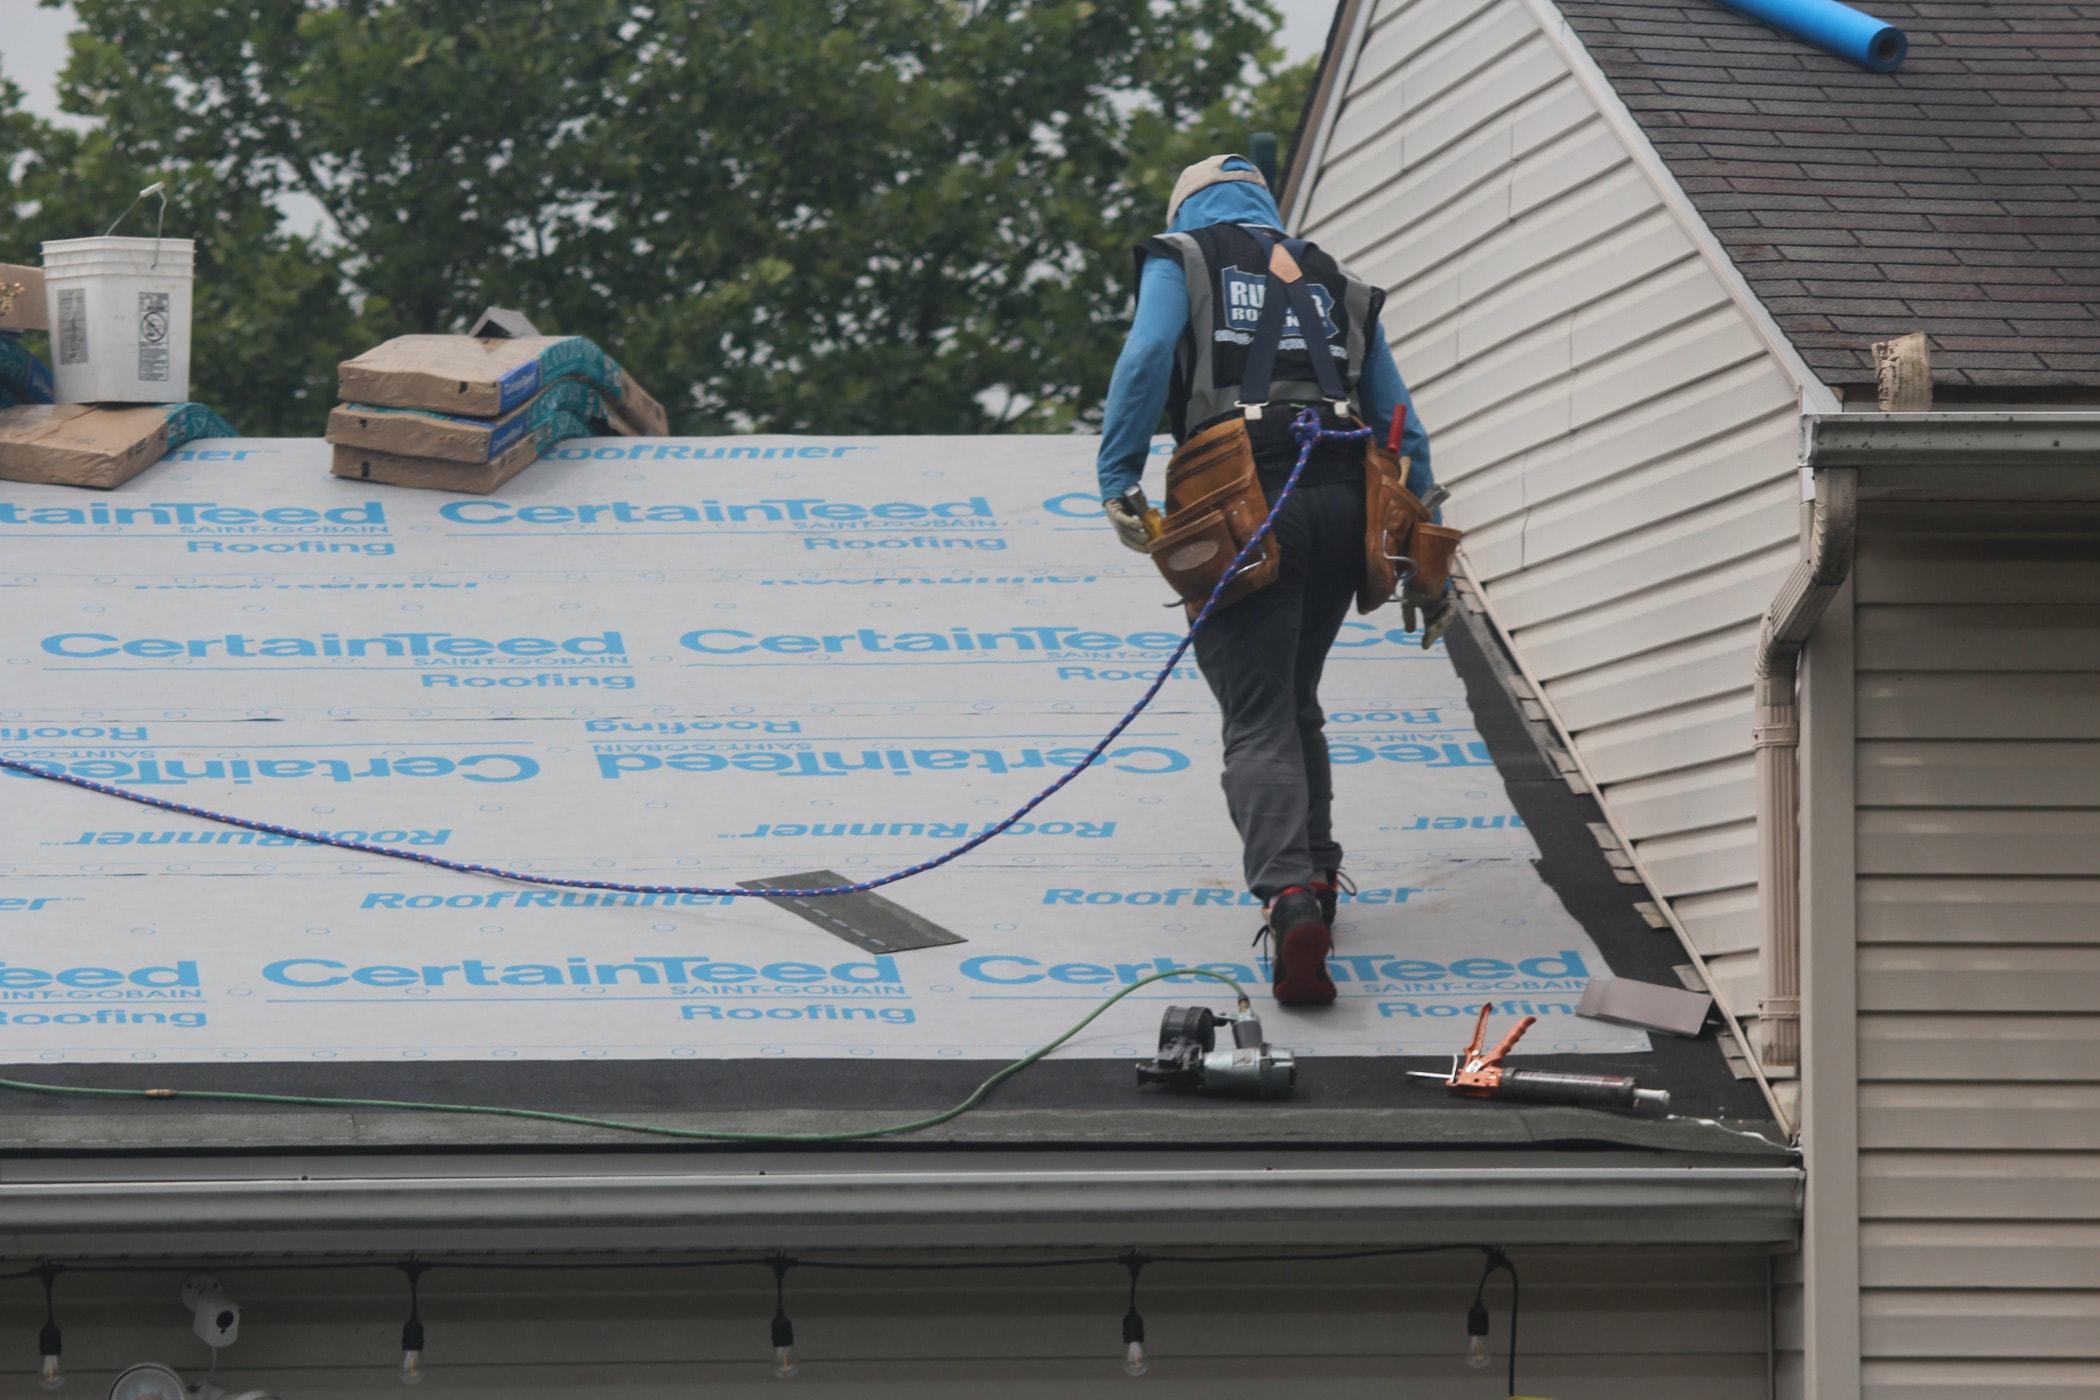 Siding, Roofer, Roof